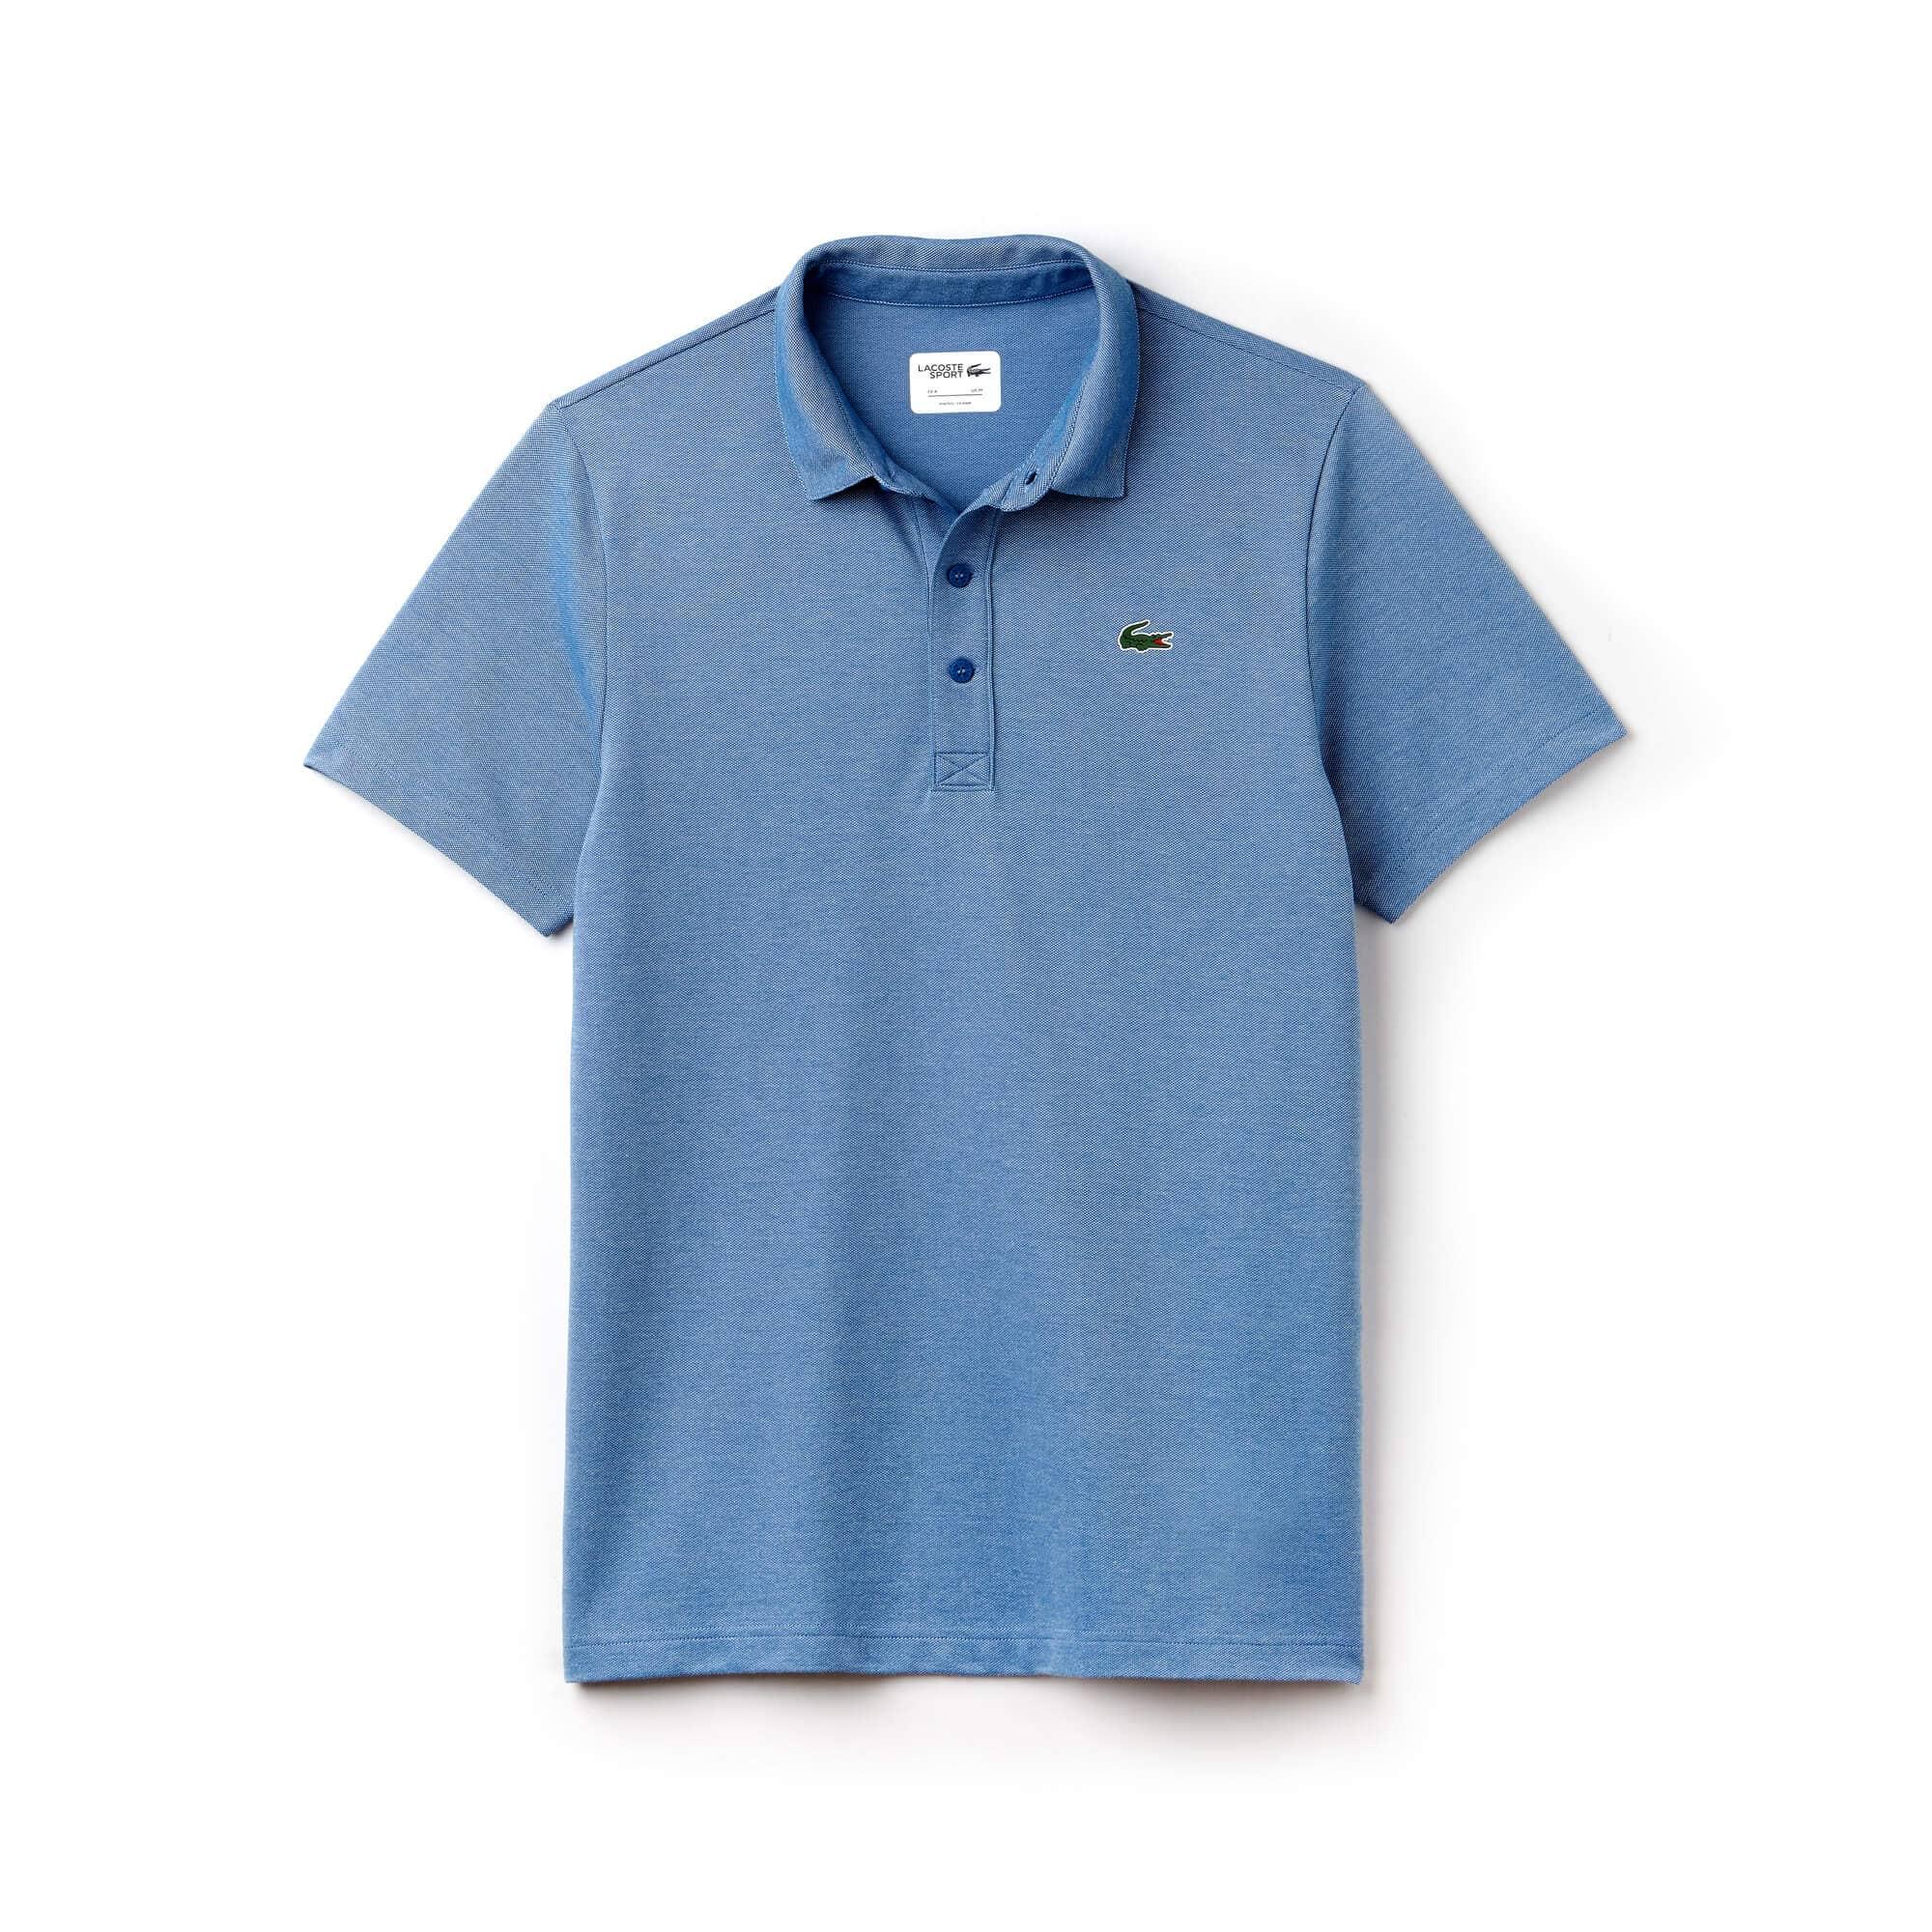 Men's Lacoste SPORT Bicolor Technical Jersey Golf Polo